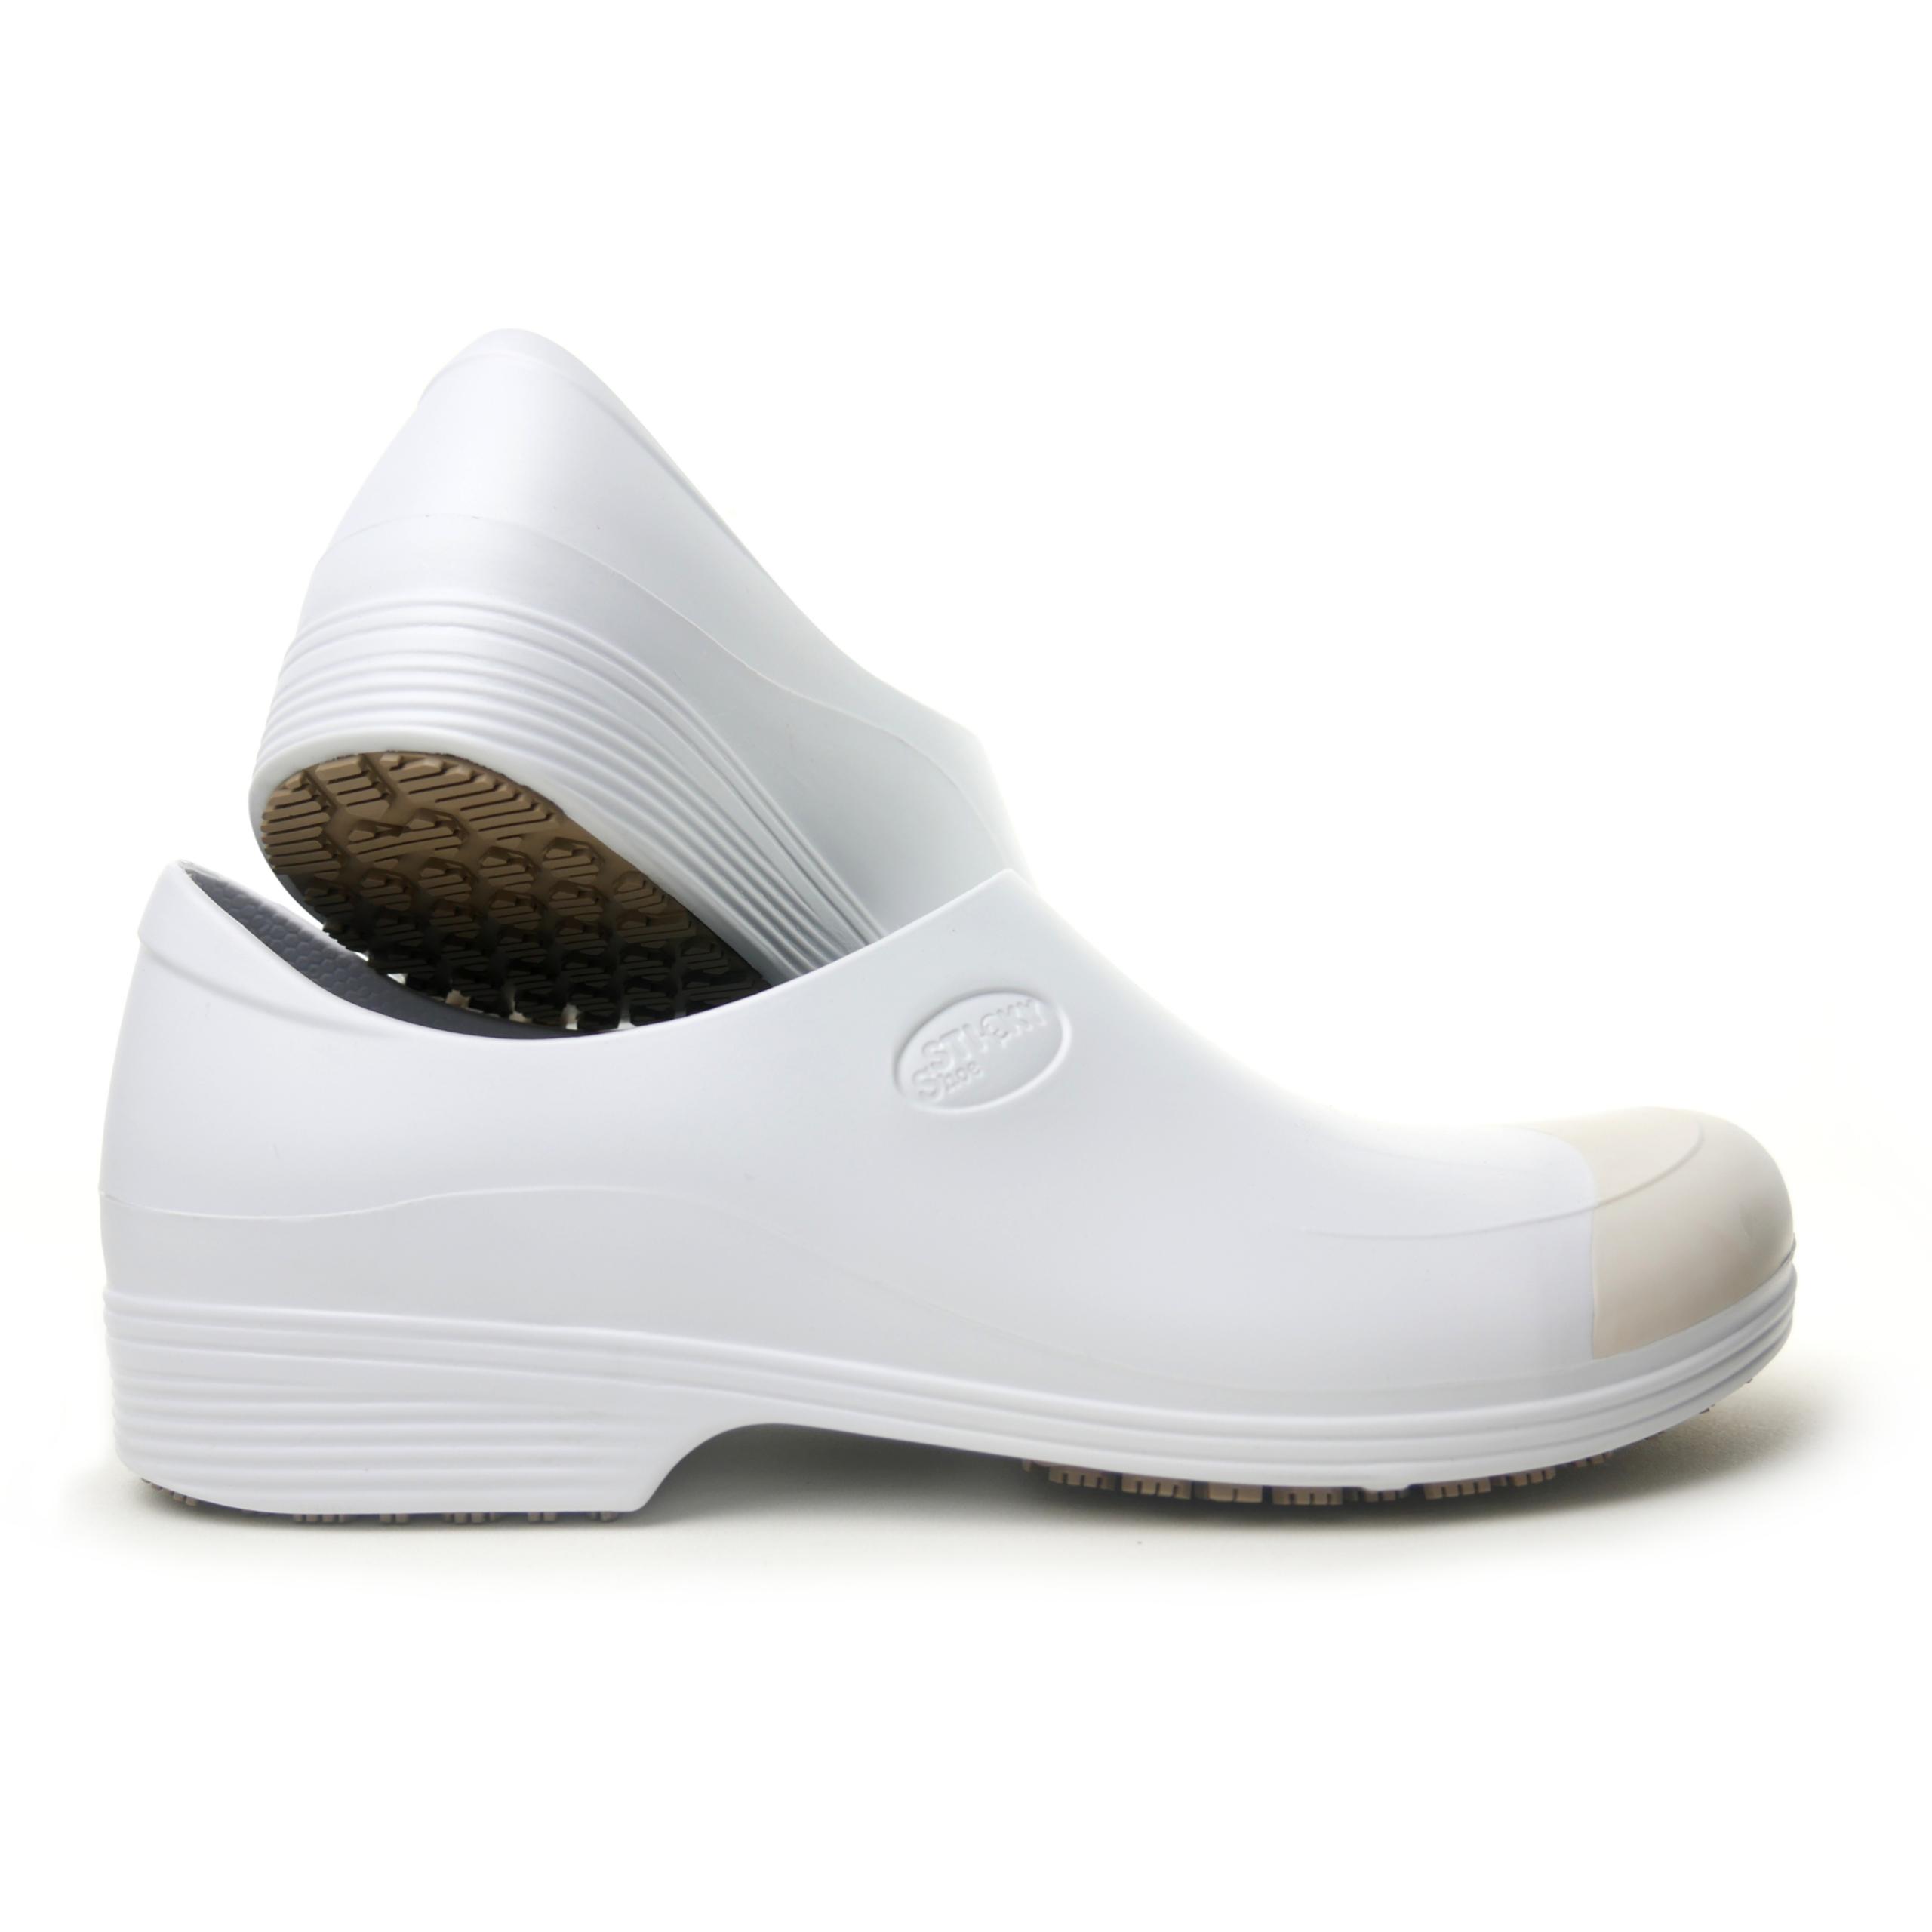 Man non-slip stickypro shoes whit toe cap - white